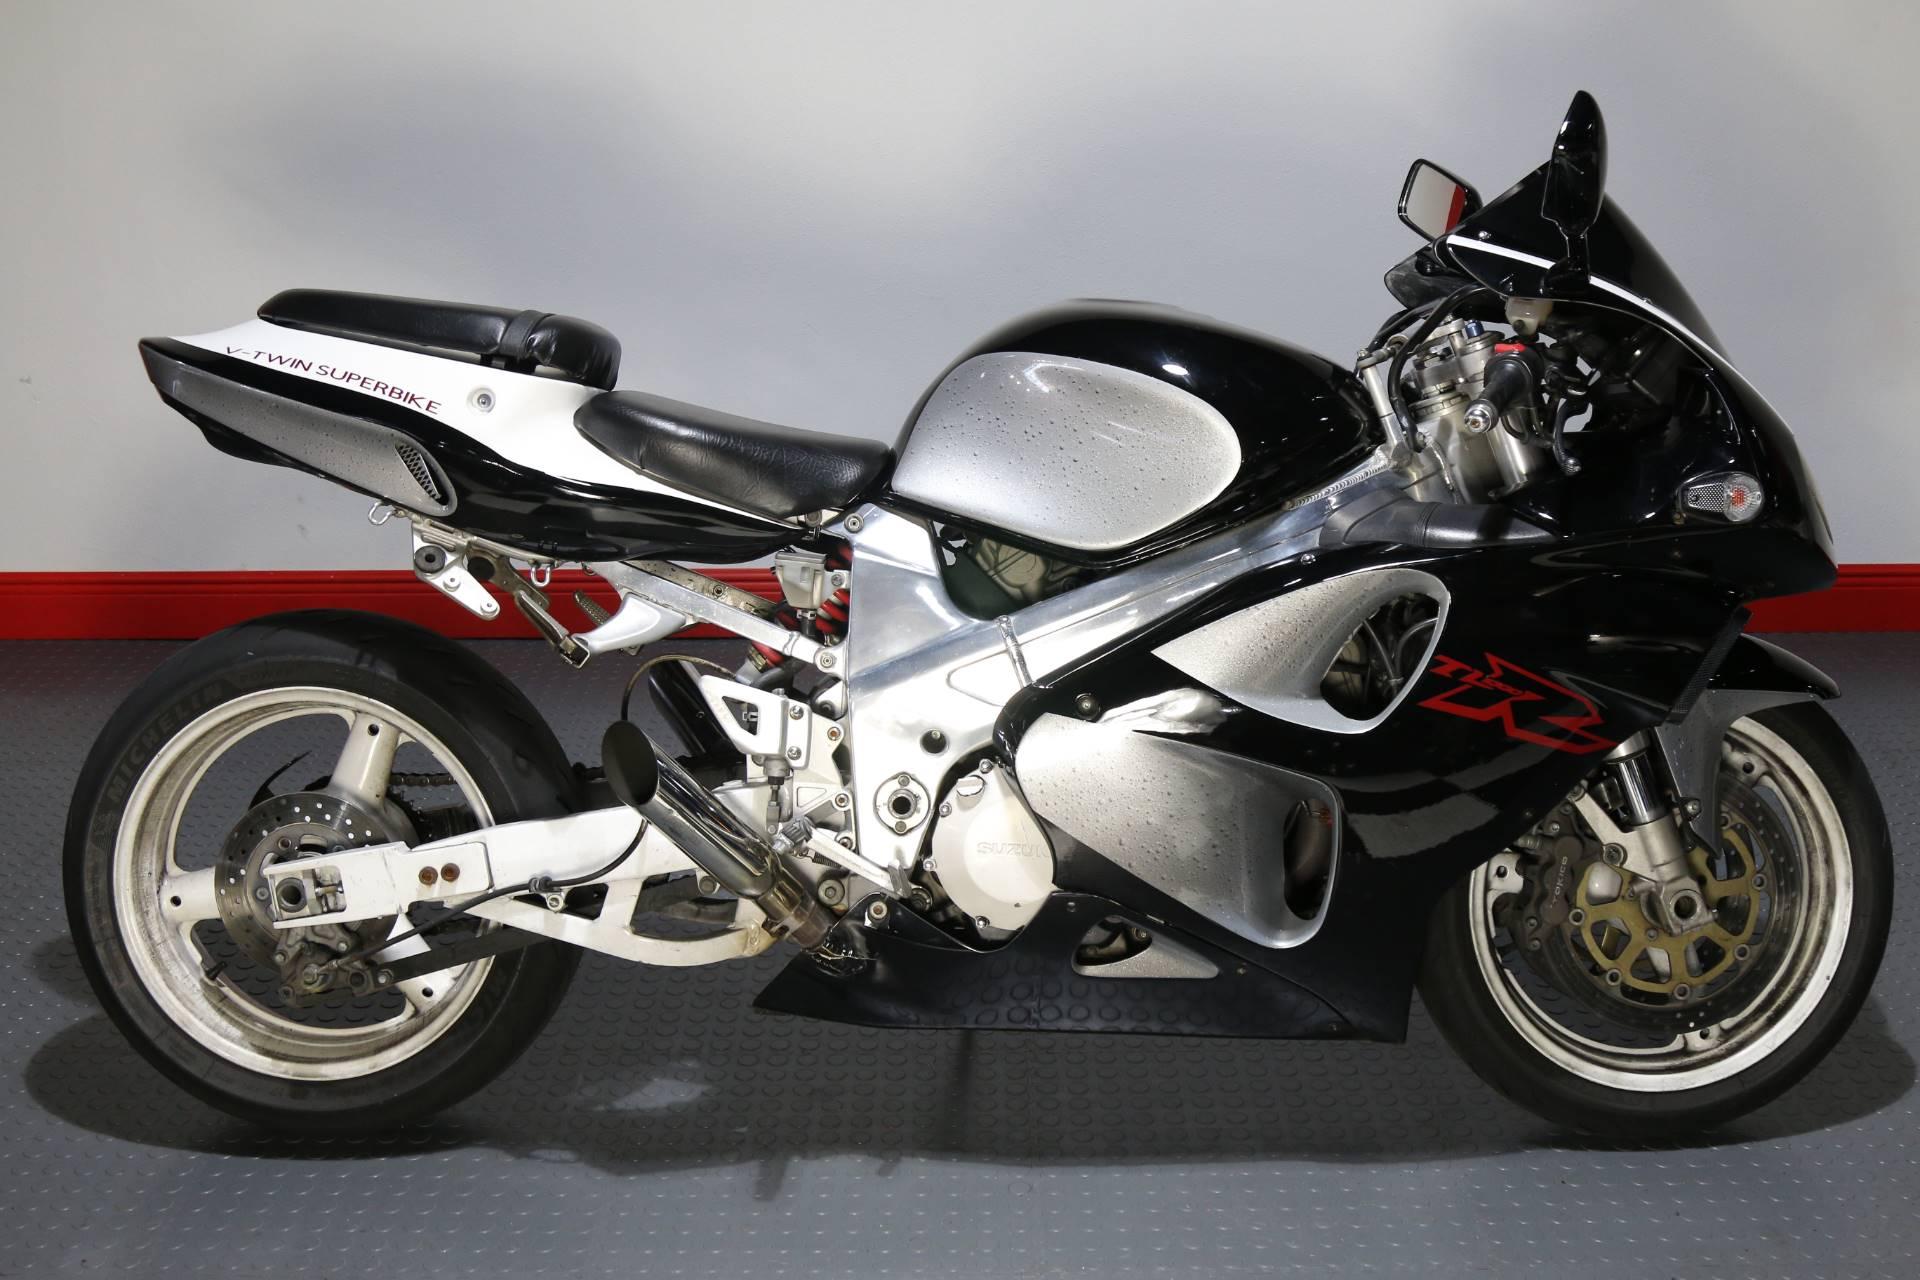 Used 2001 Suzuki Tl1000r Motorcycles In Pinellas Park Fl